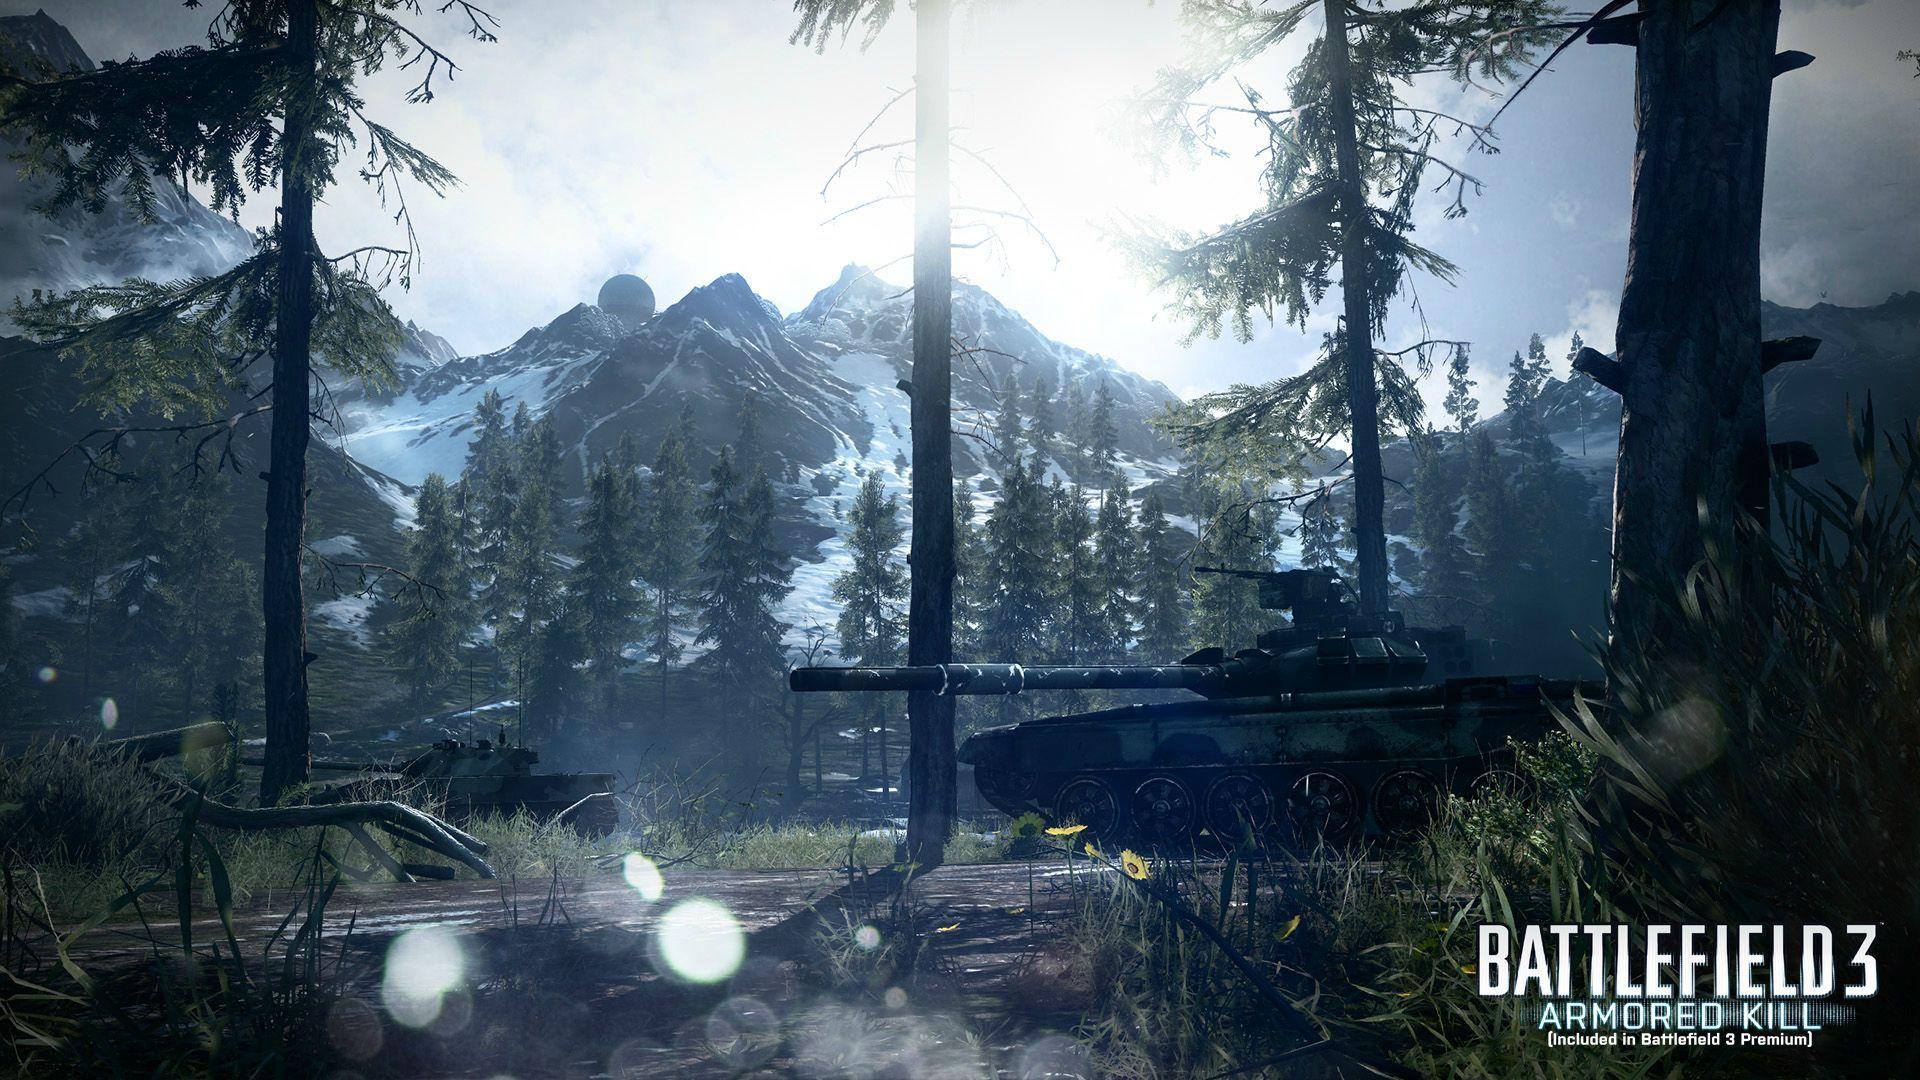 battlefield 3 armored kill dlc images Battlefield 3, Ea